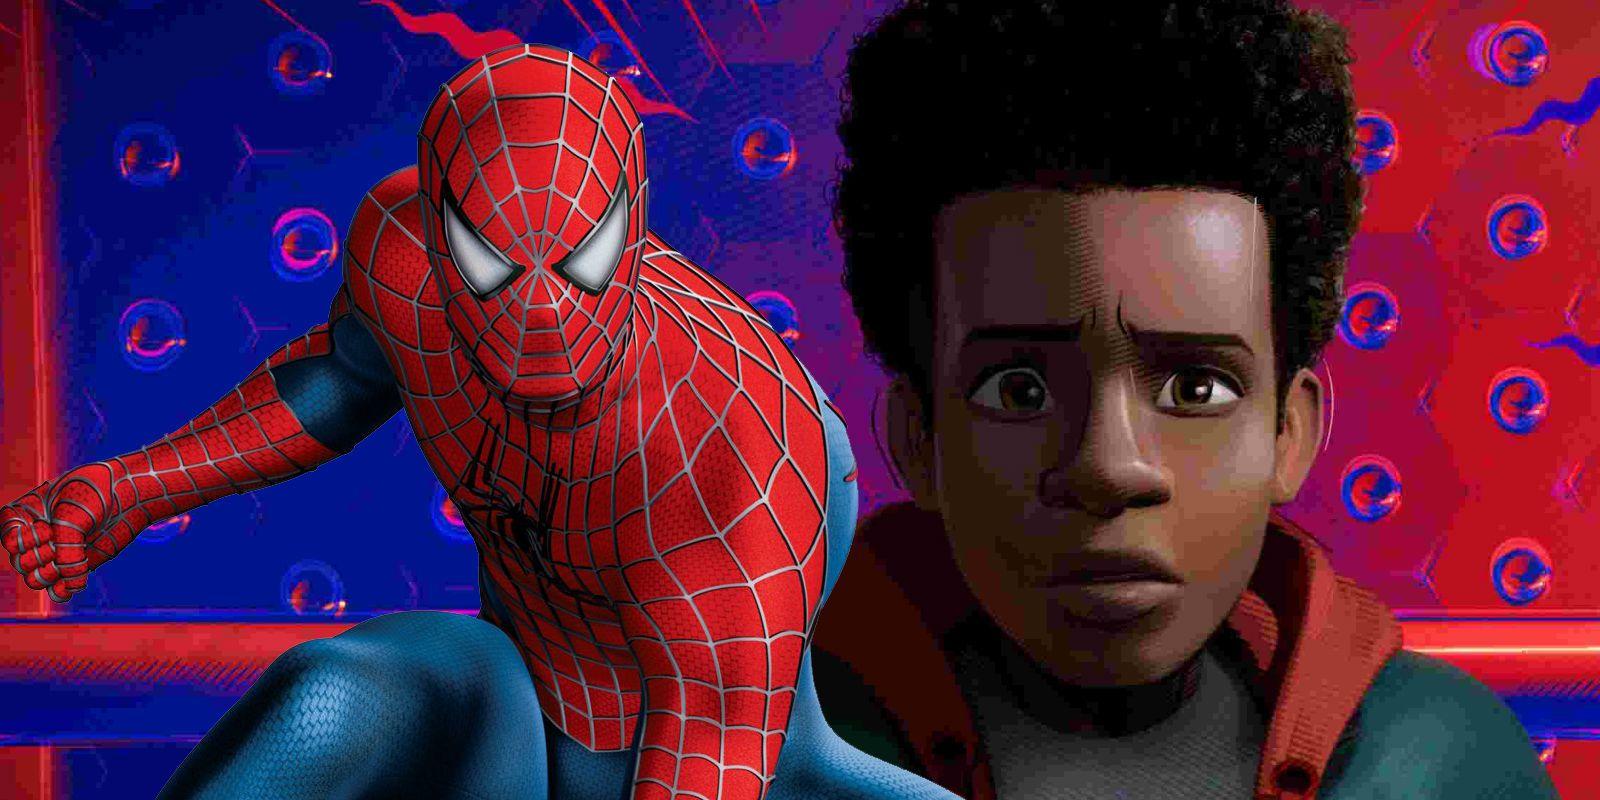 Spider-Verse Producer: Sam Raimi Should Direct Animated Spider-Man Movie